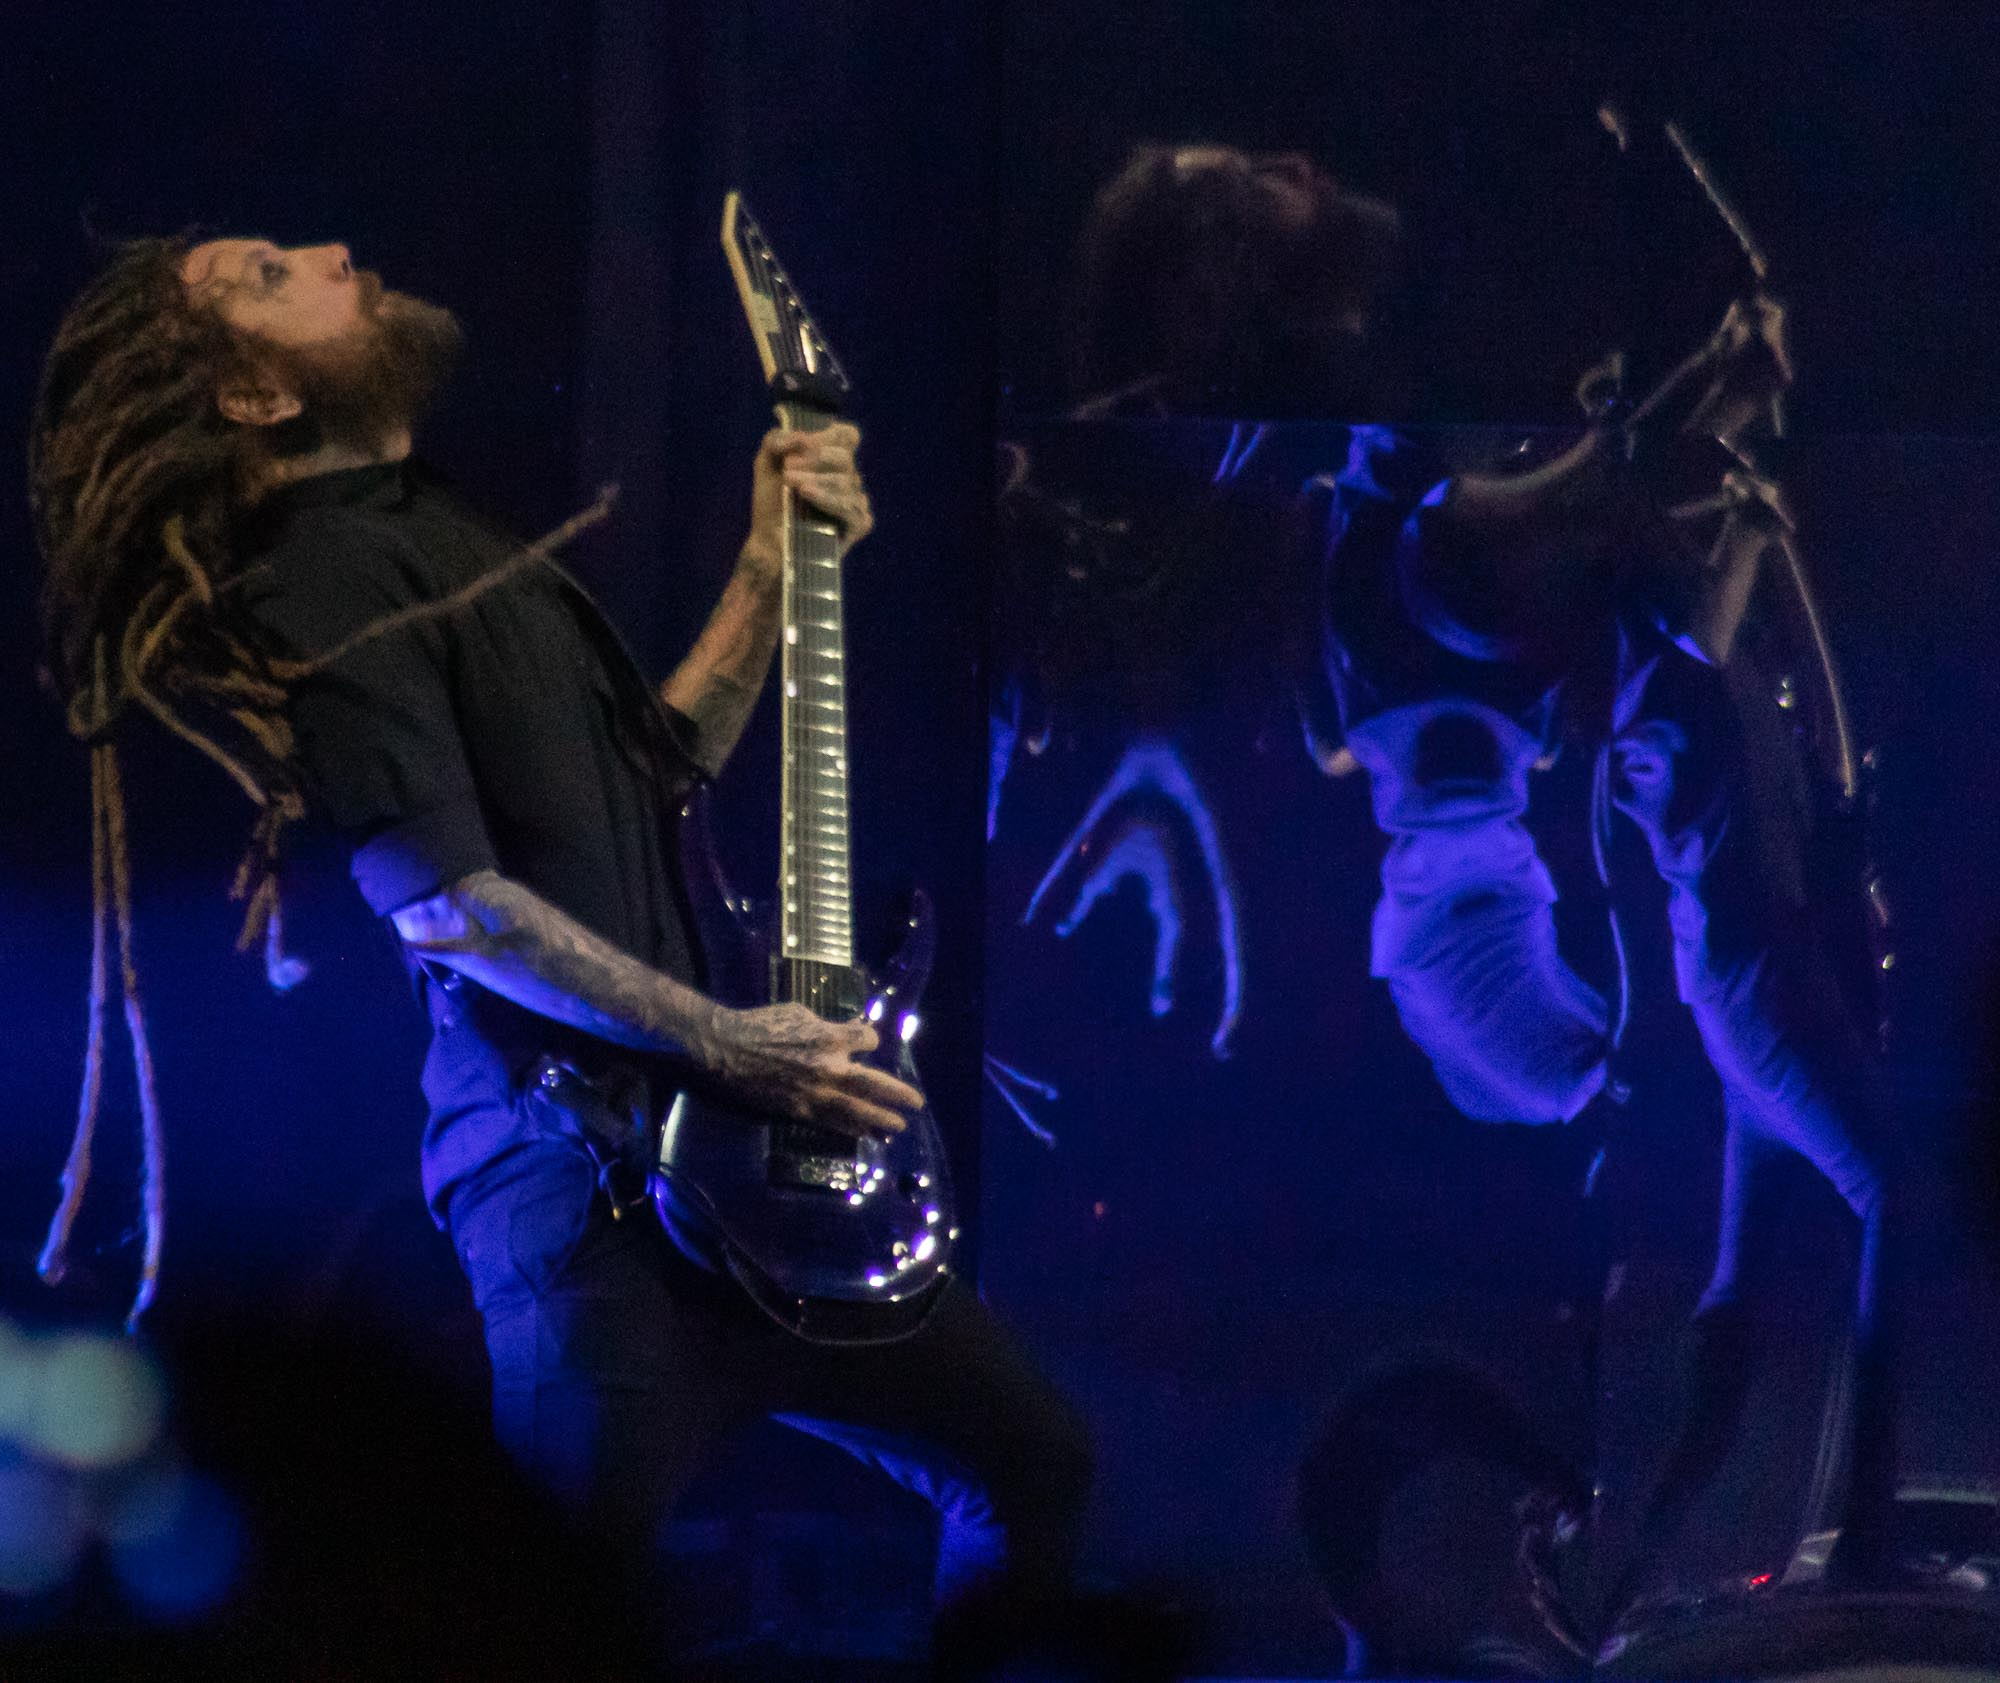 Korn-BudweiserStage-Toronto_Ontario-20190814-JeremyGretzinger19